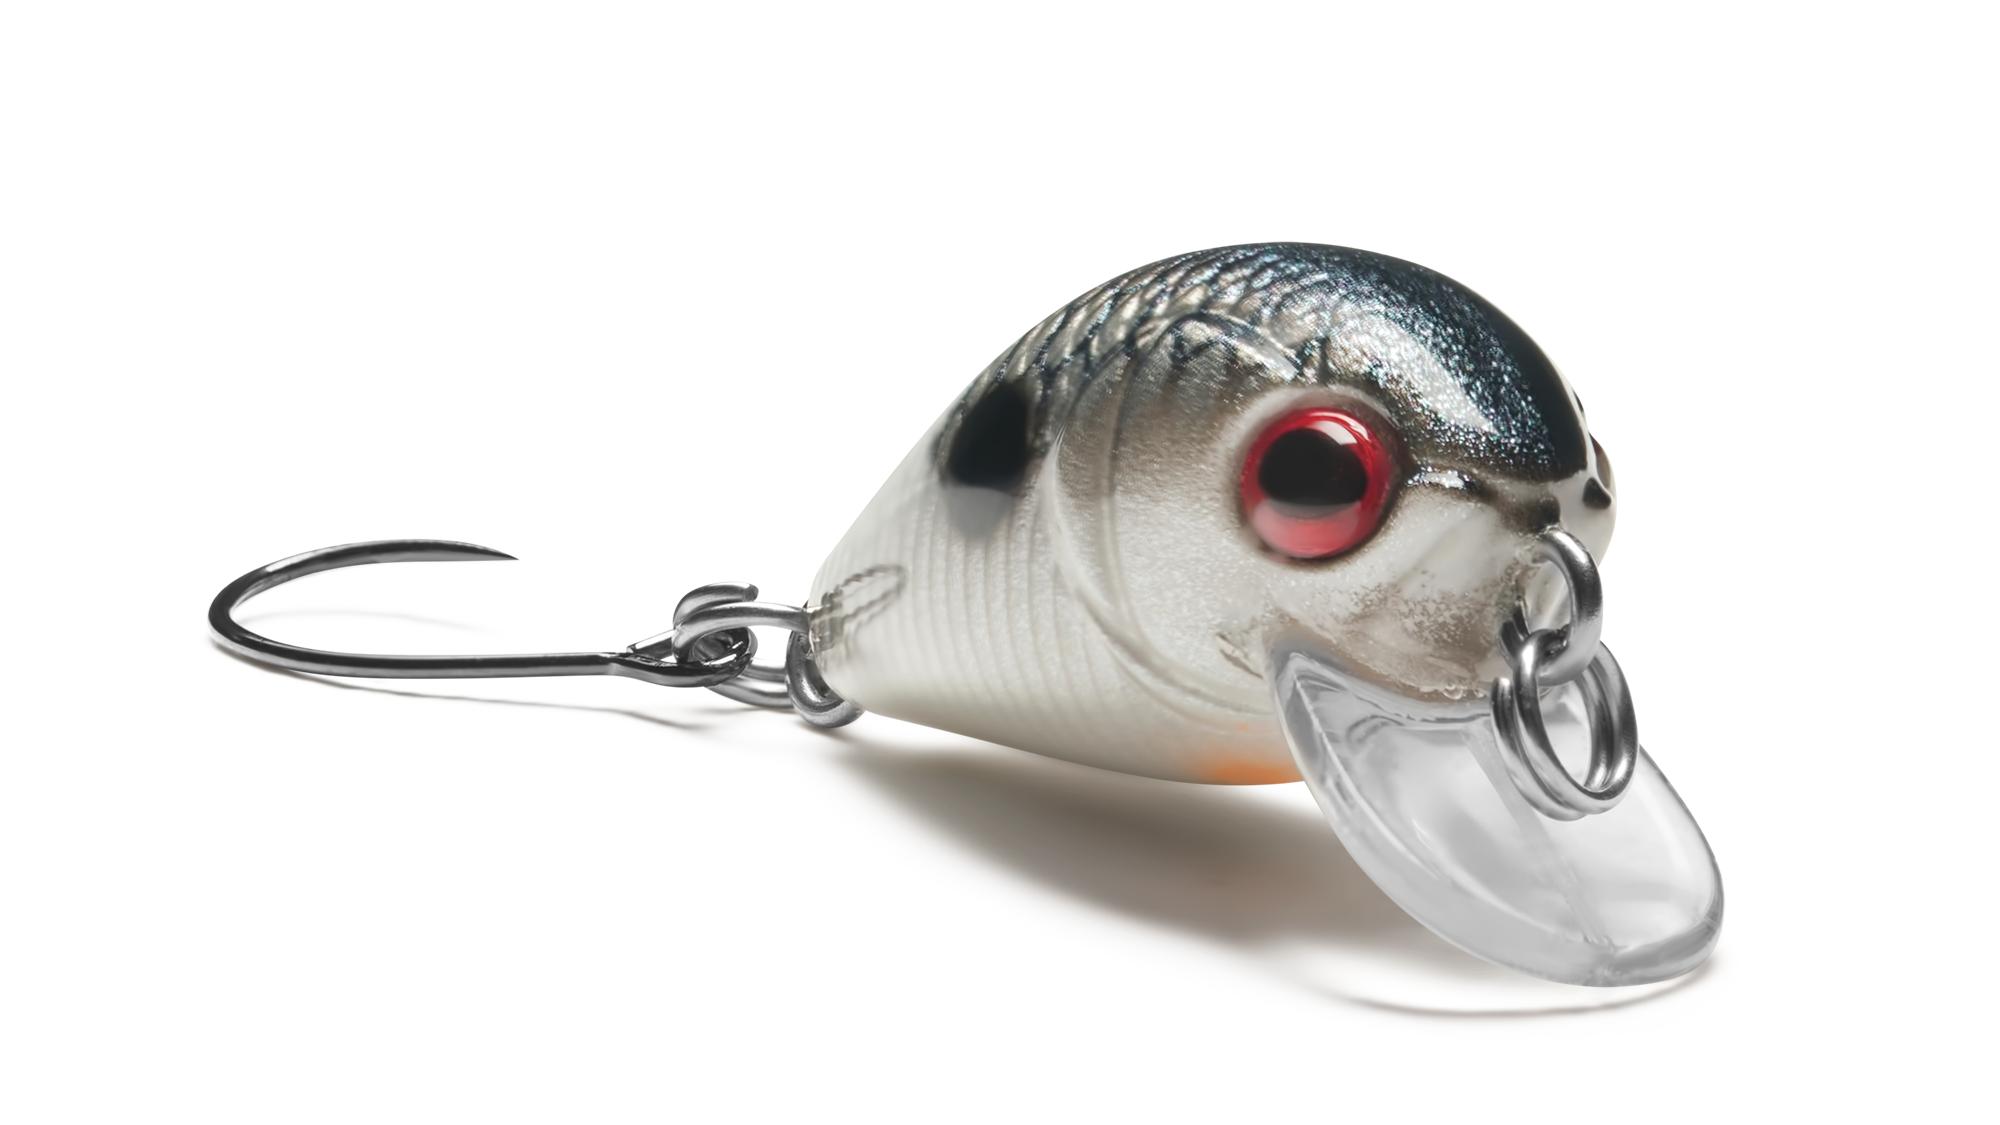 EG-182-SP Crazy Plankton